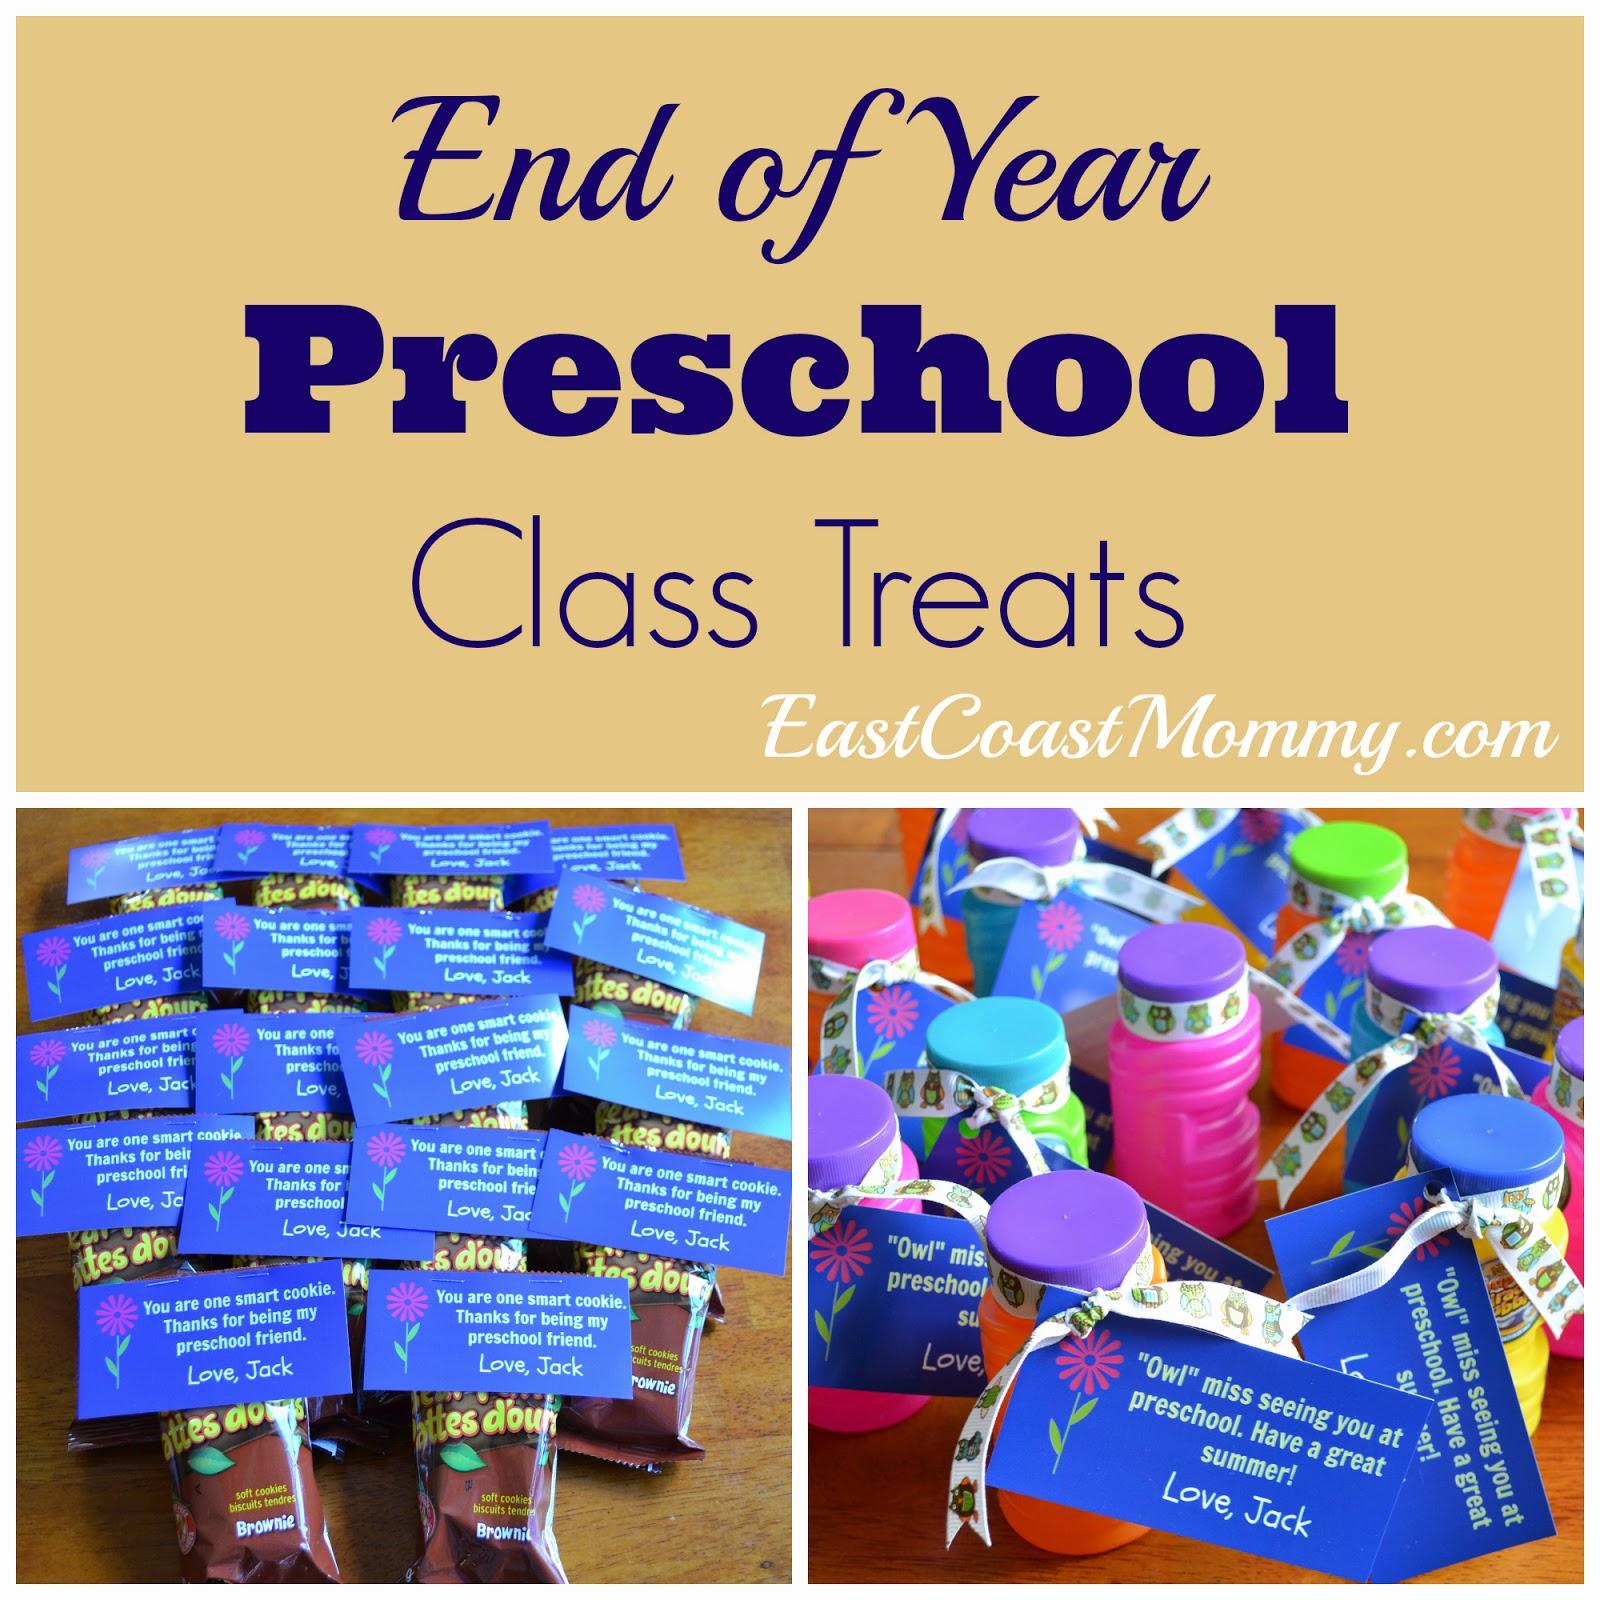 East Coast Mommy Simple Preschool Class Treats